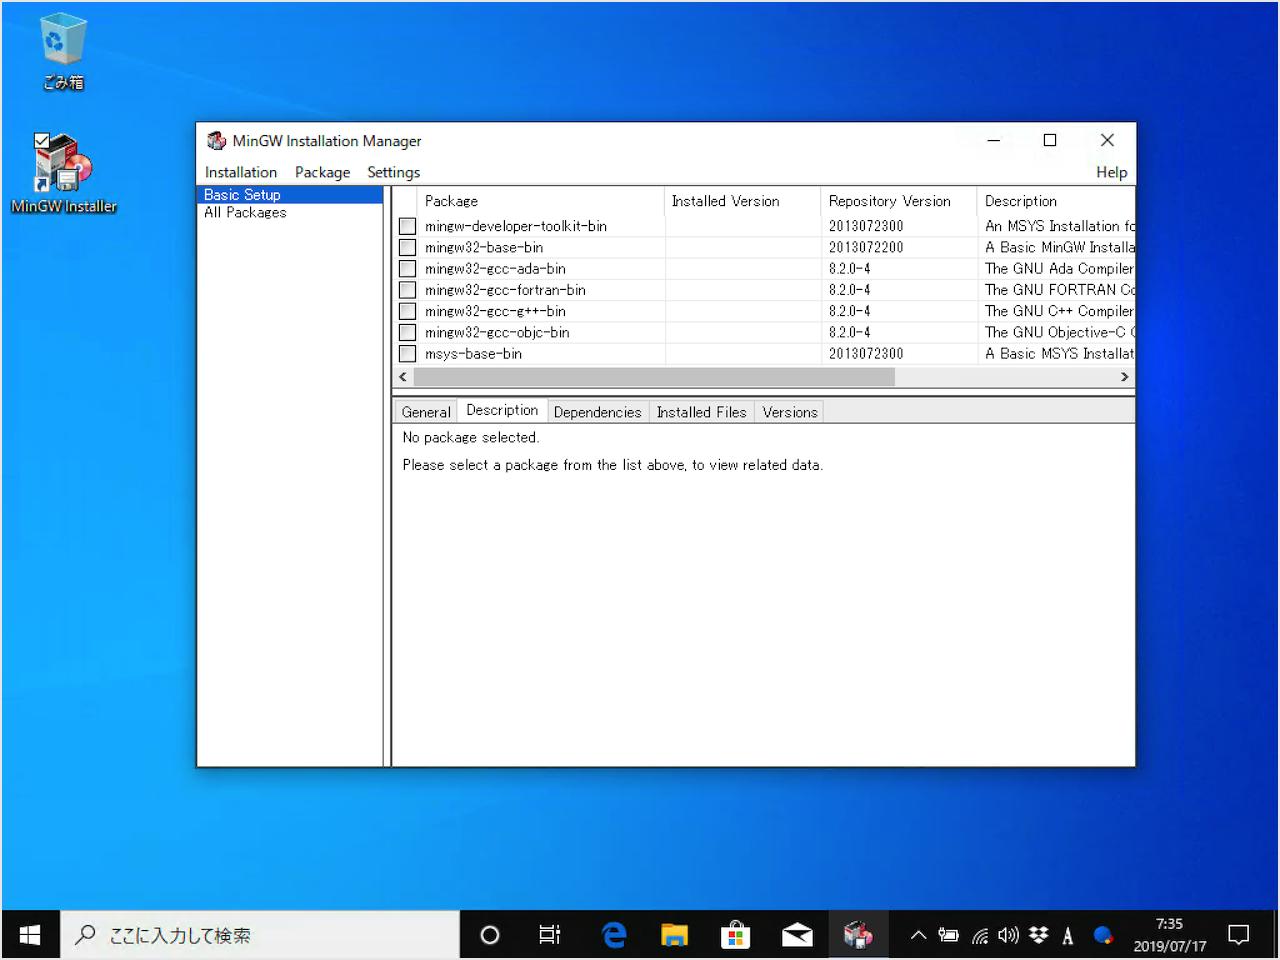 C言語入門 - MinGW - gcc のインストール - Windows環境 - Webkaru